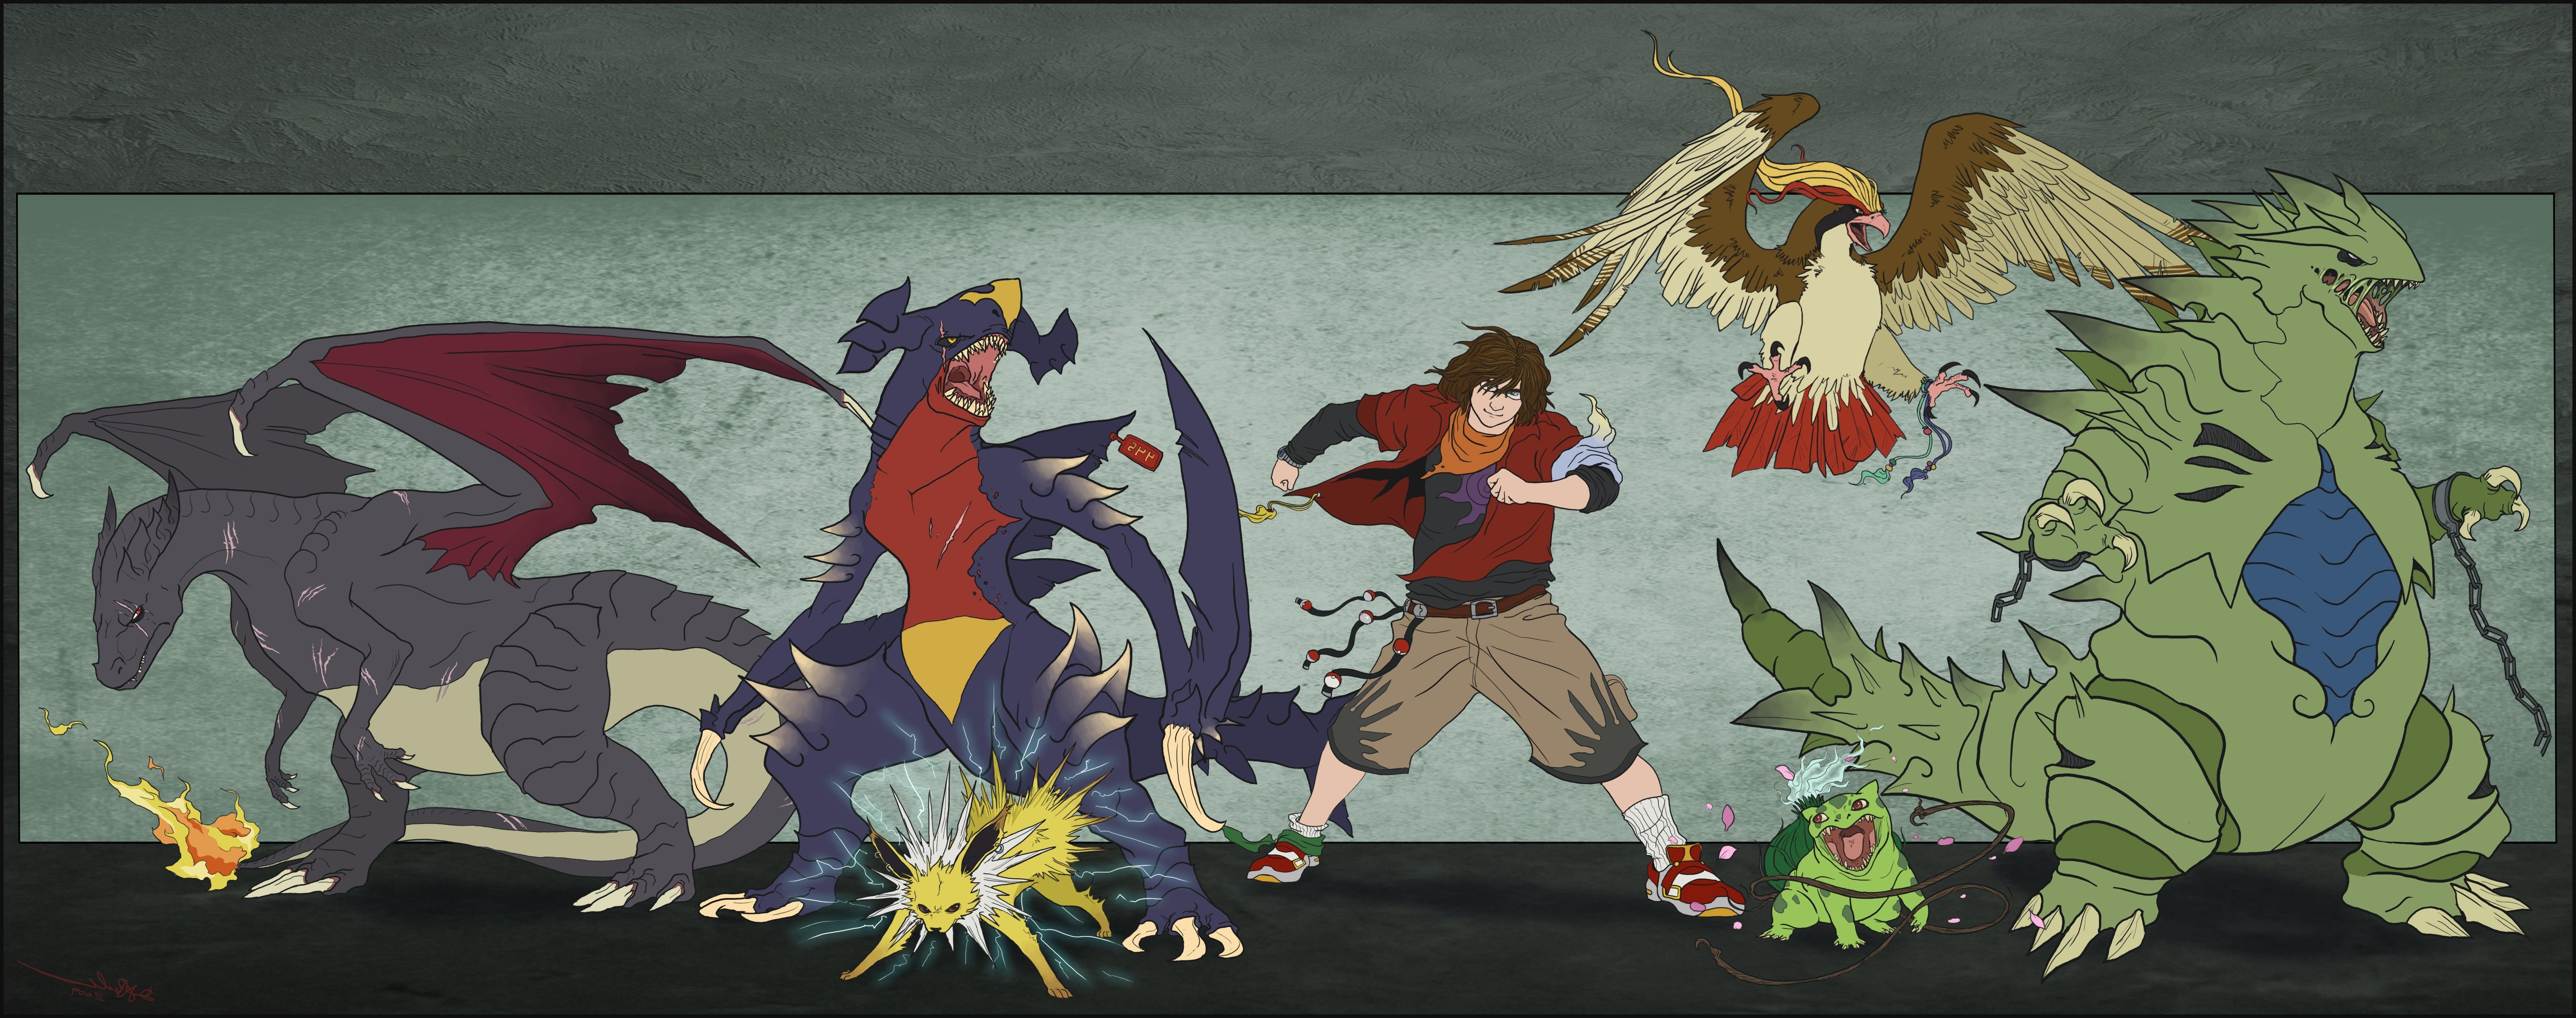 Wallpaper : illustration, red, Joltion, Charizard, comics, Bulbasaur …